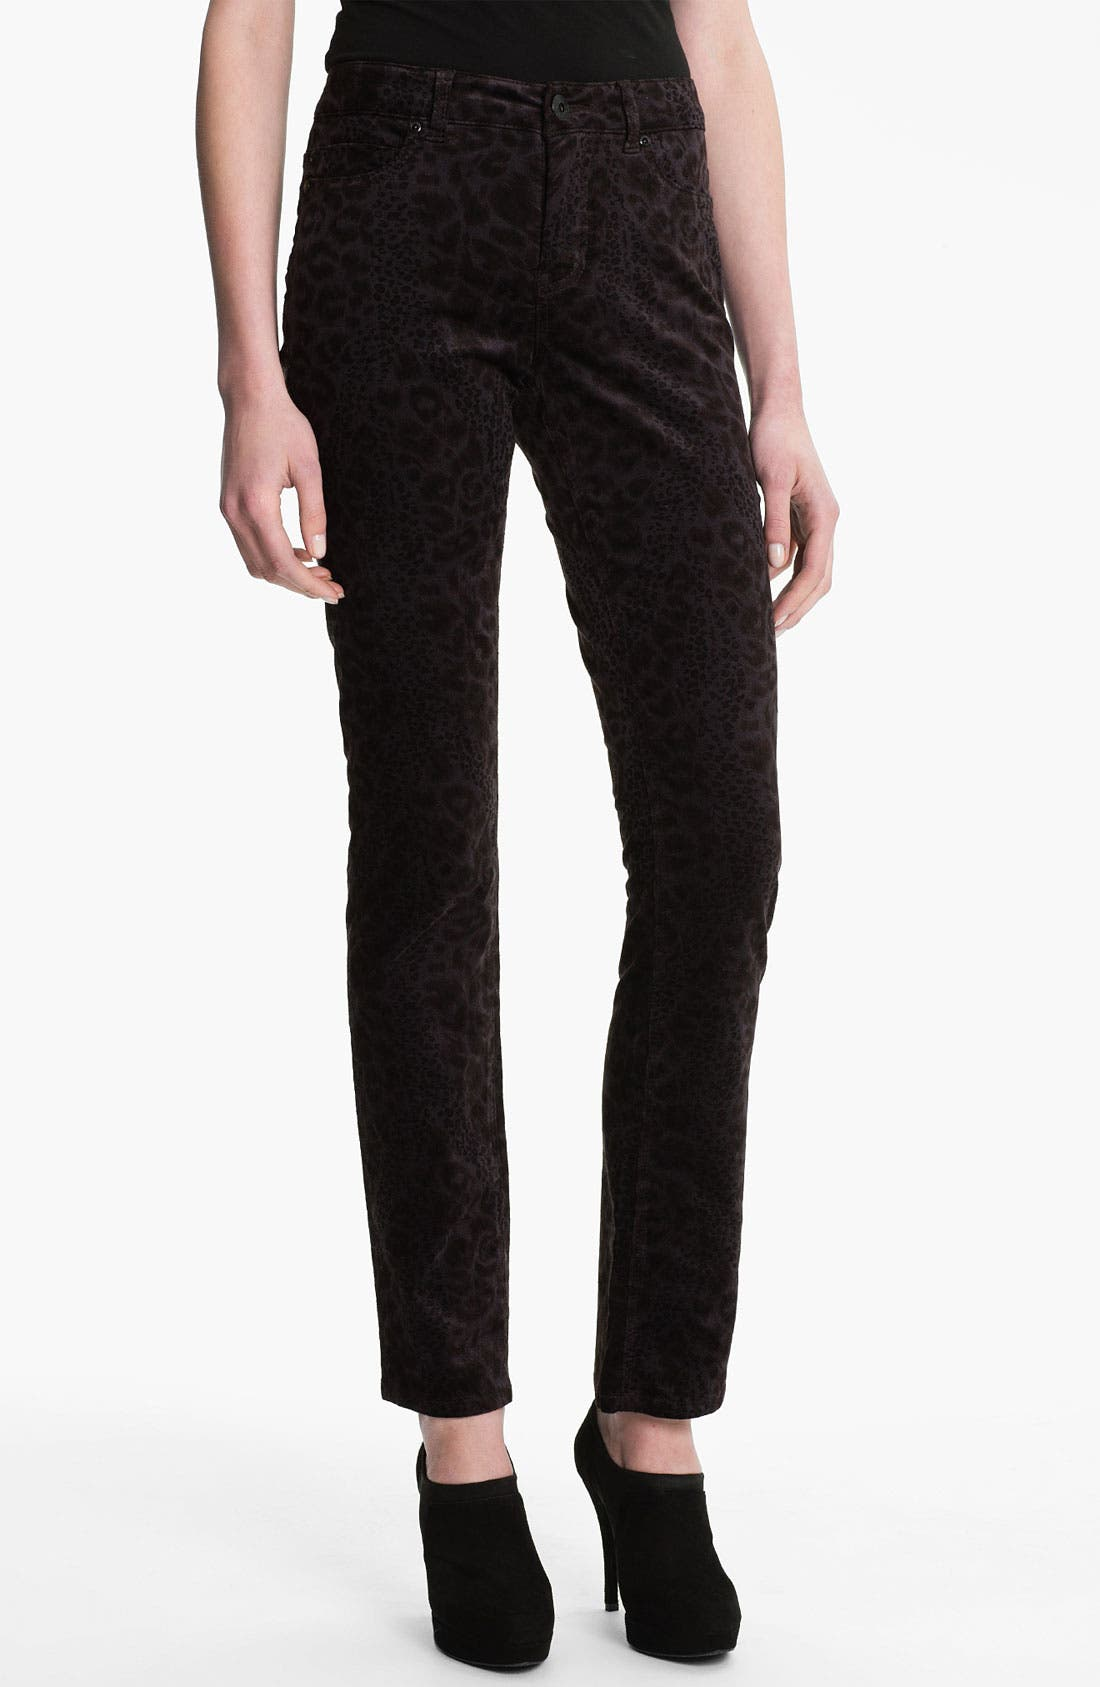 Alternate Image 1 Selected - Liverpool Jeans Company 'Sadie' Print Straight Leg Velveteen Jeans